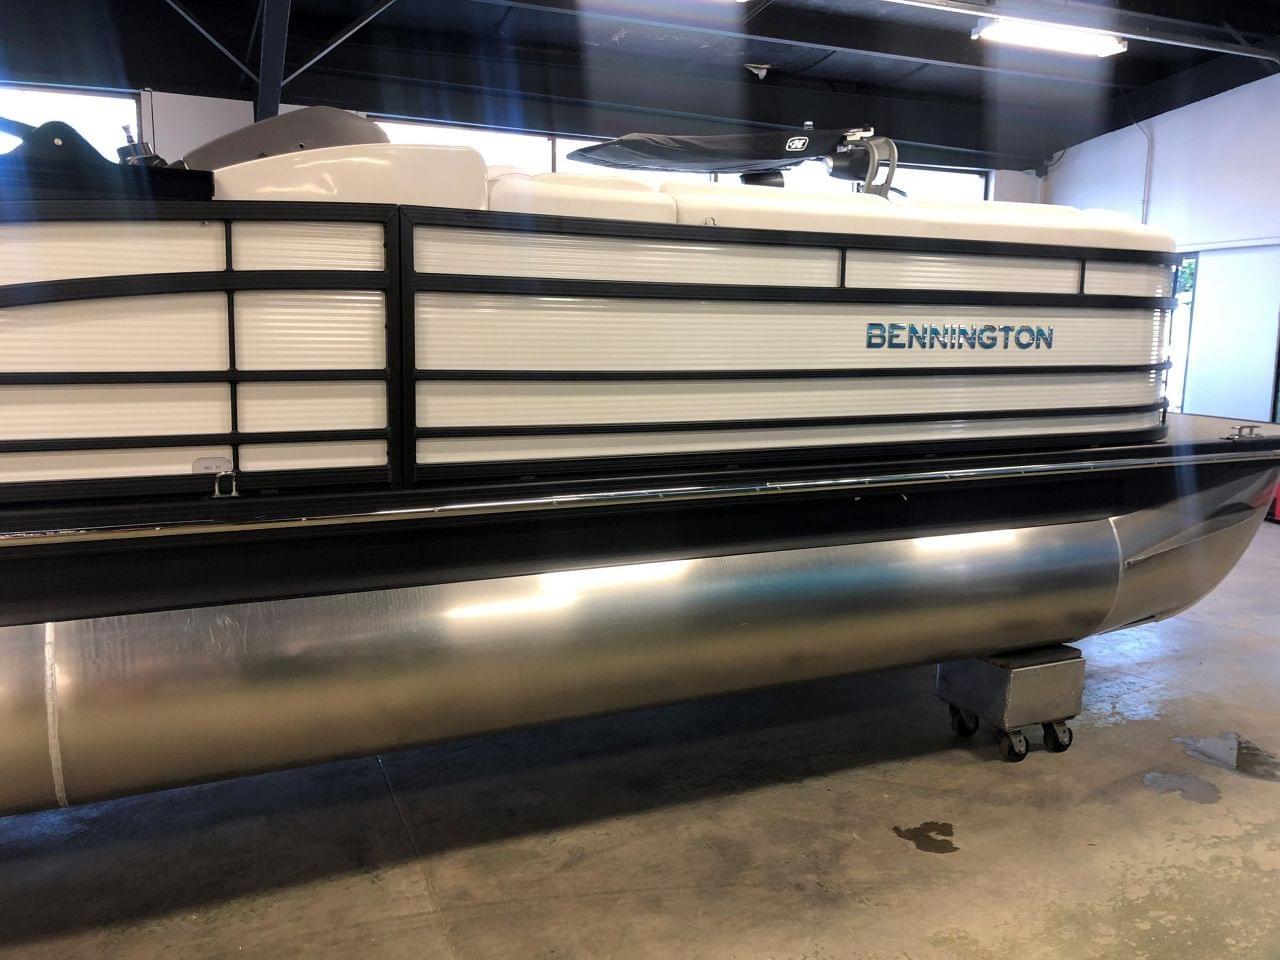 Bennington 25RSB